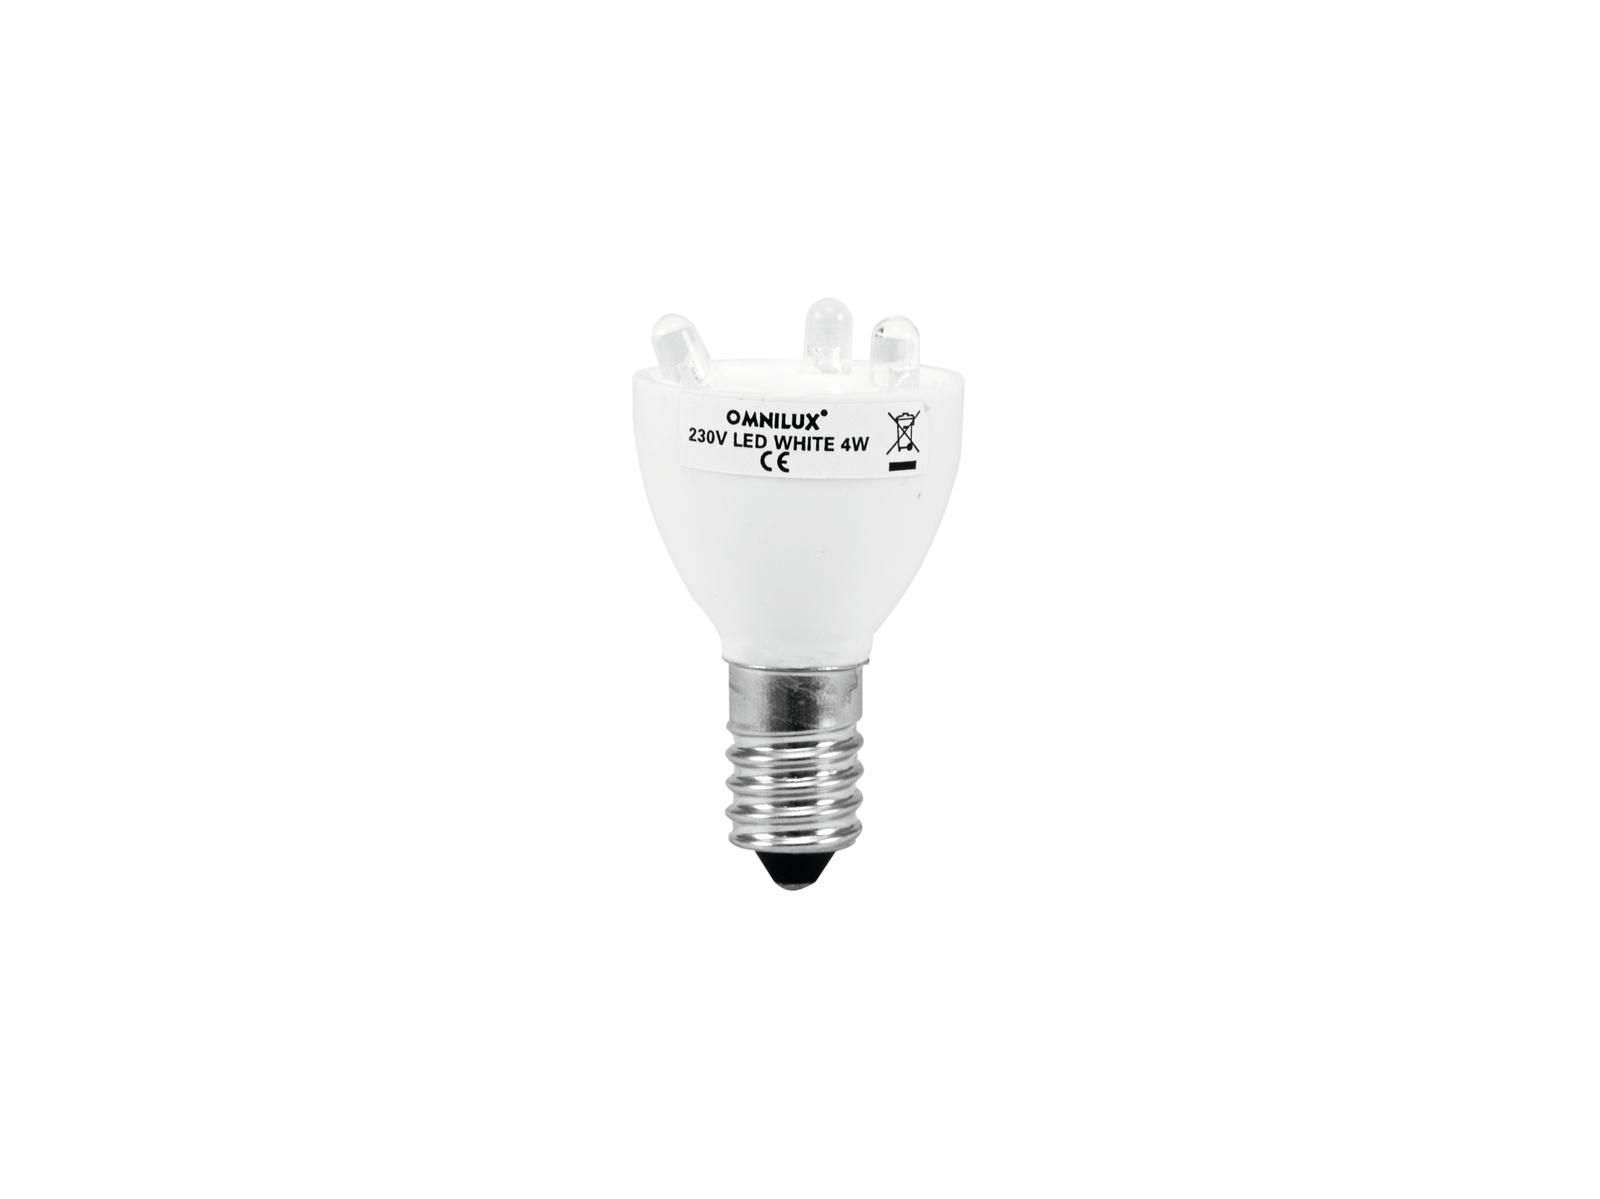 Lampadina a LED con diodi bianchi 230V E-14 3 OMNILUX